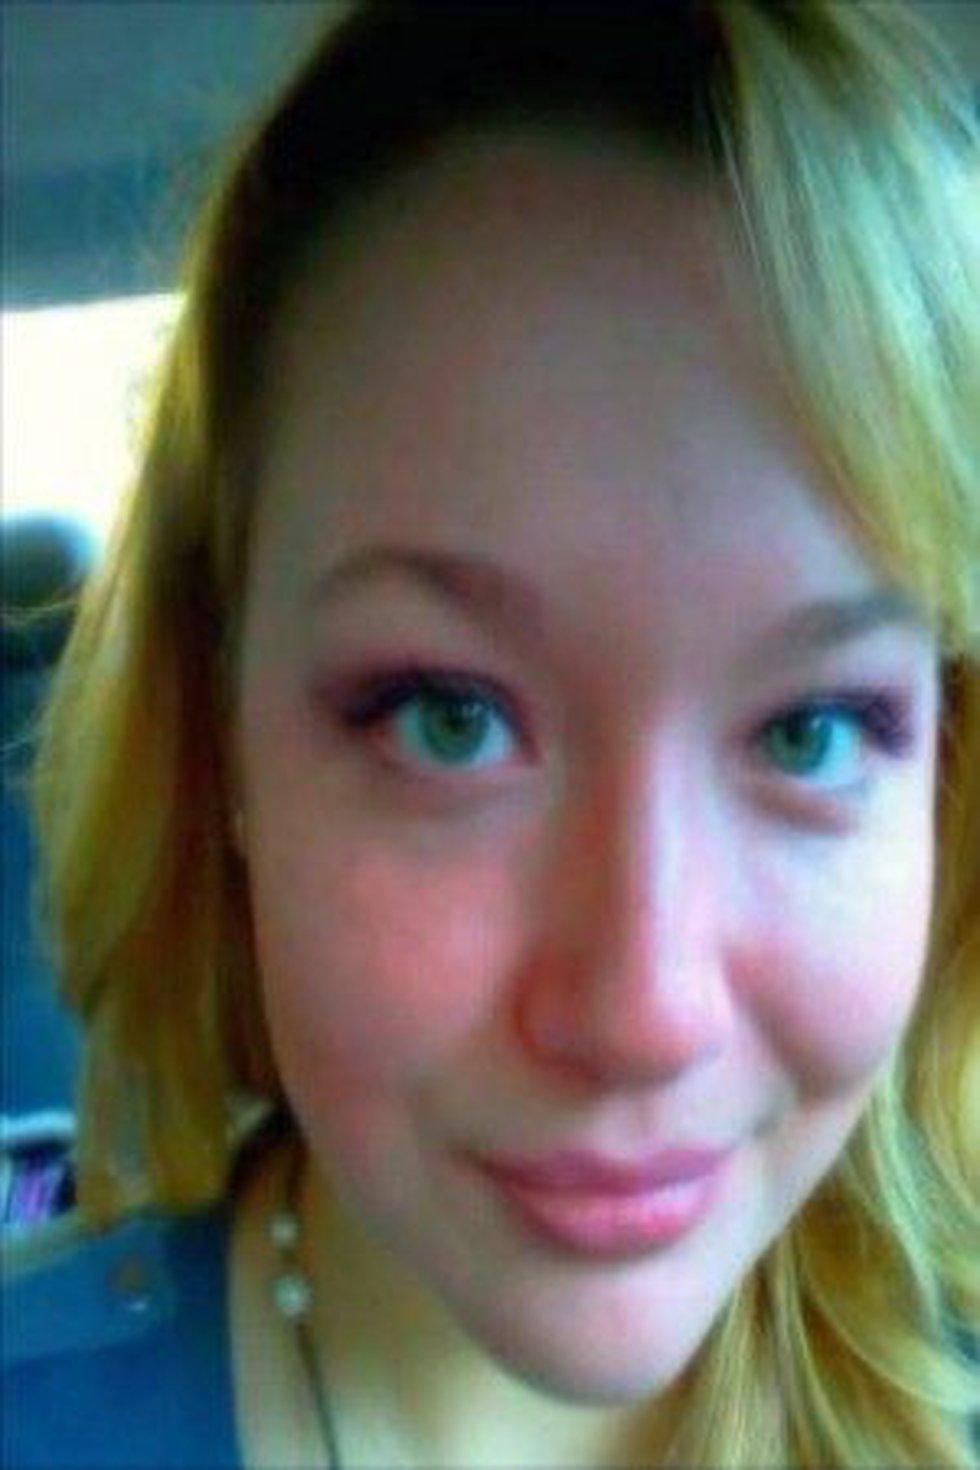 Victim: Emily Pickels